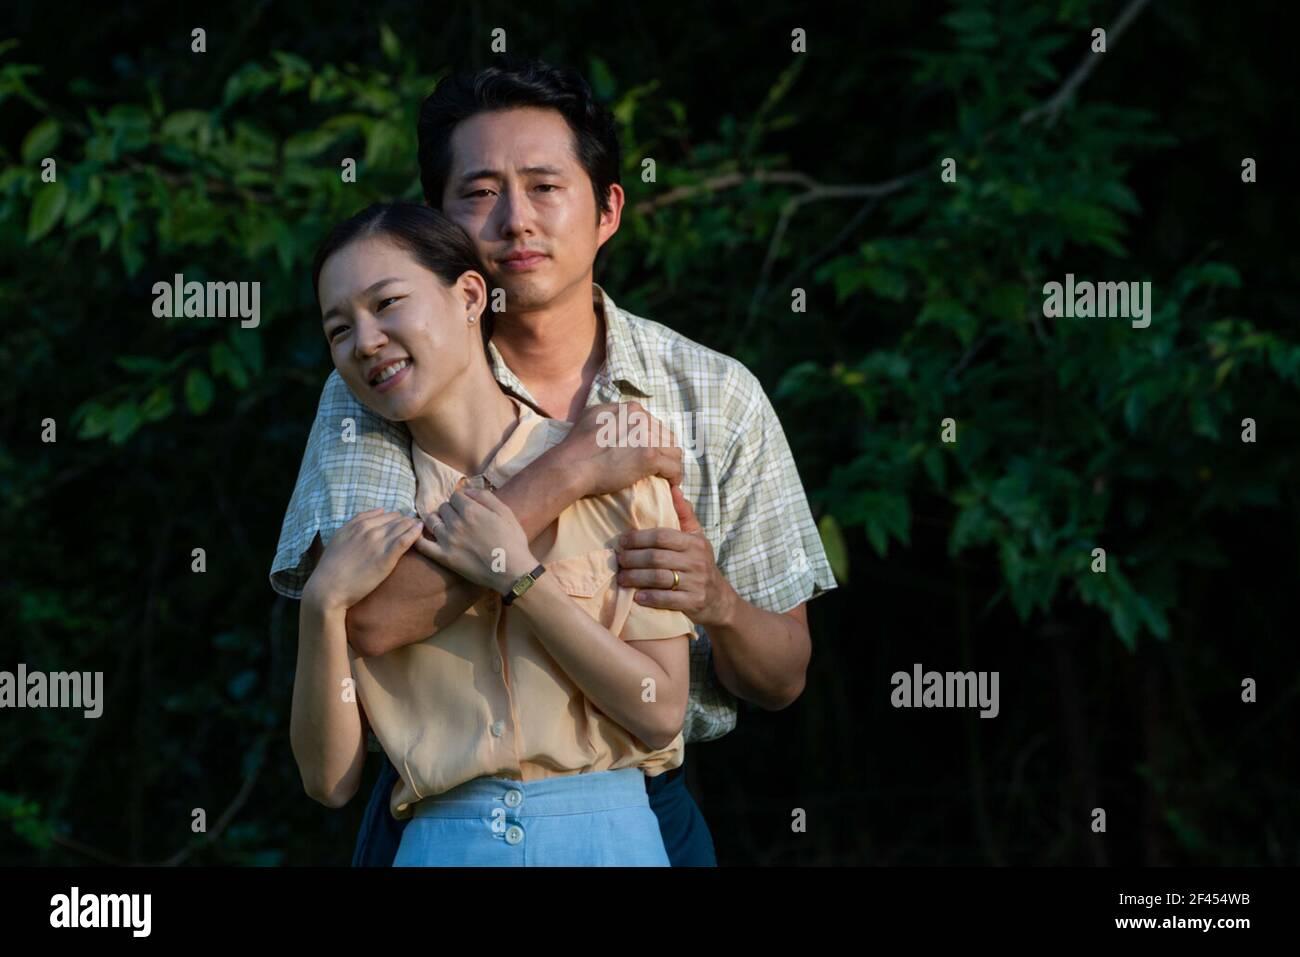 MINARI (2020) HAN YERI STEVEN YEUN LEE ISAAC CHUNG (DIR) A24/MOVIESTORE COLLECTION LTD Stockfoto